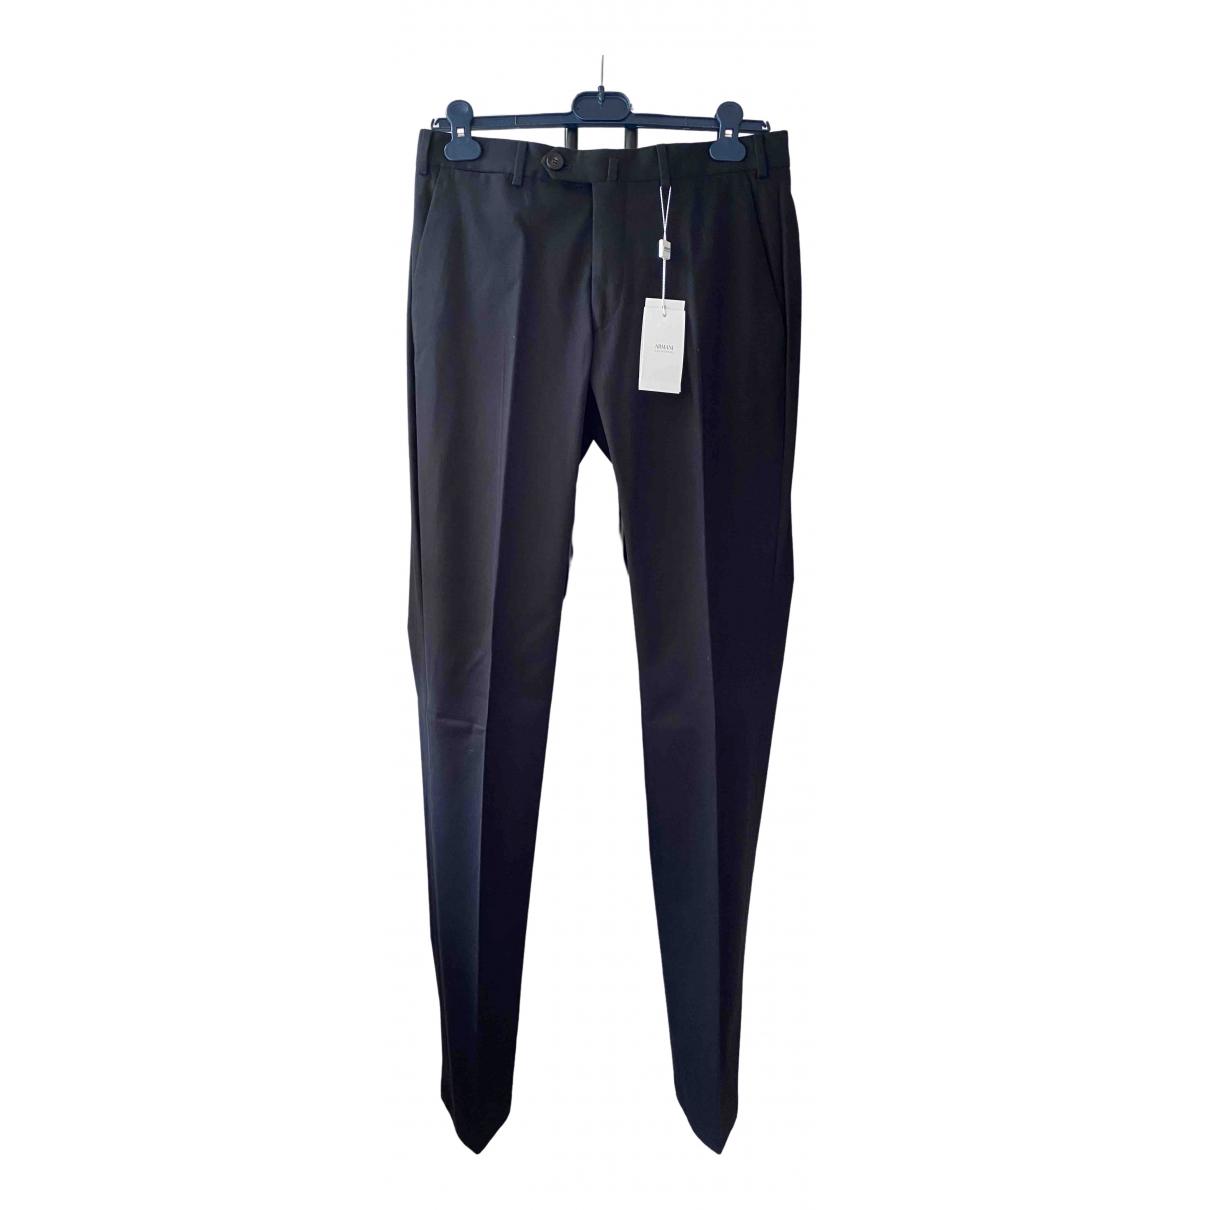 Armani Collezioni \N Black Cotton Trousers for Men 46 IT